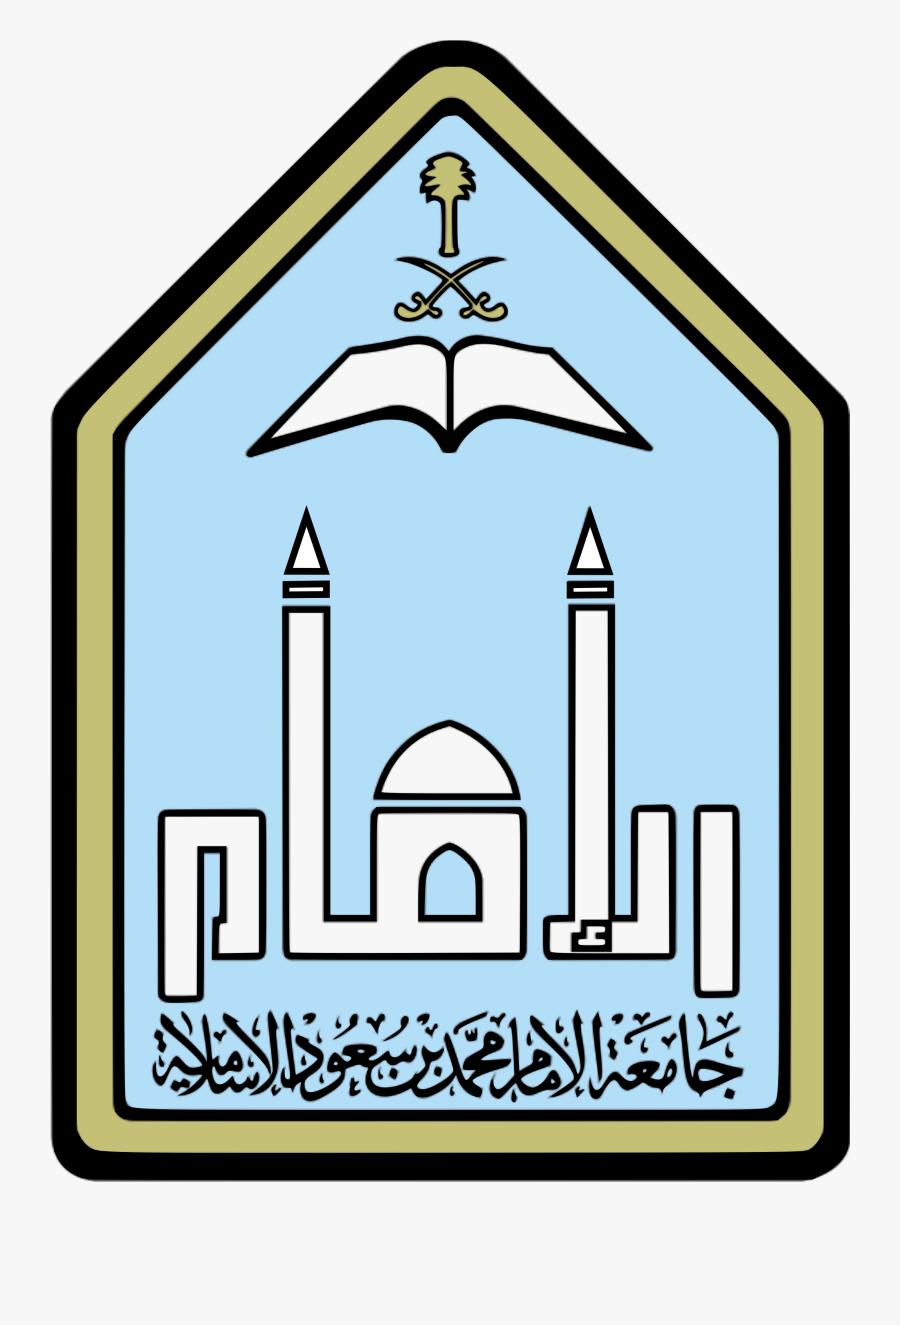 Islam Clipart Imam - Imam Muhammad Ibn Saud Islamic University, Transparent Clipart